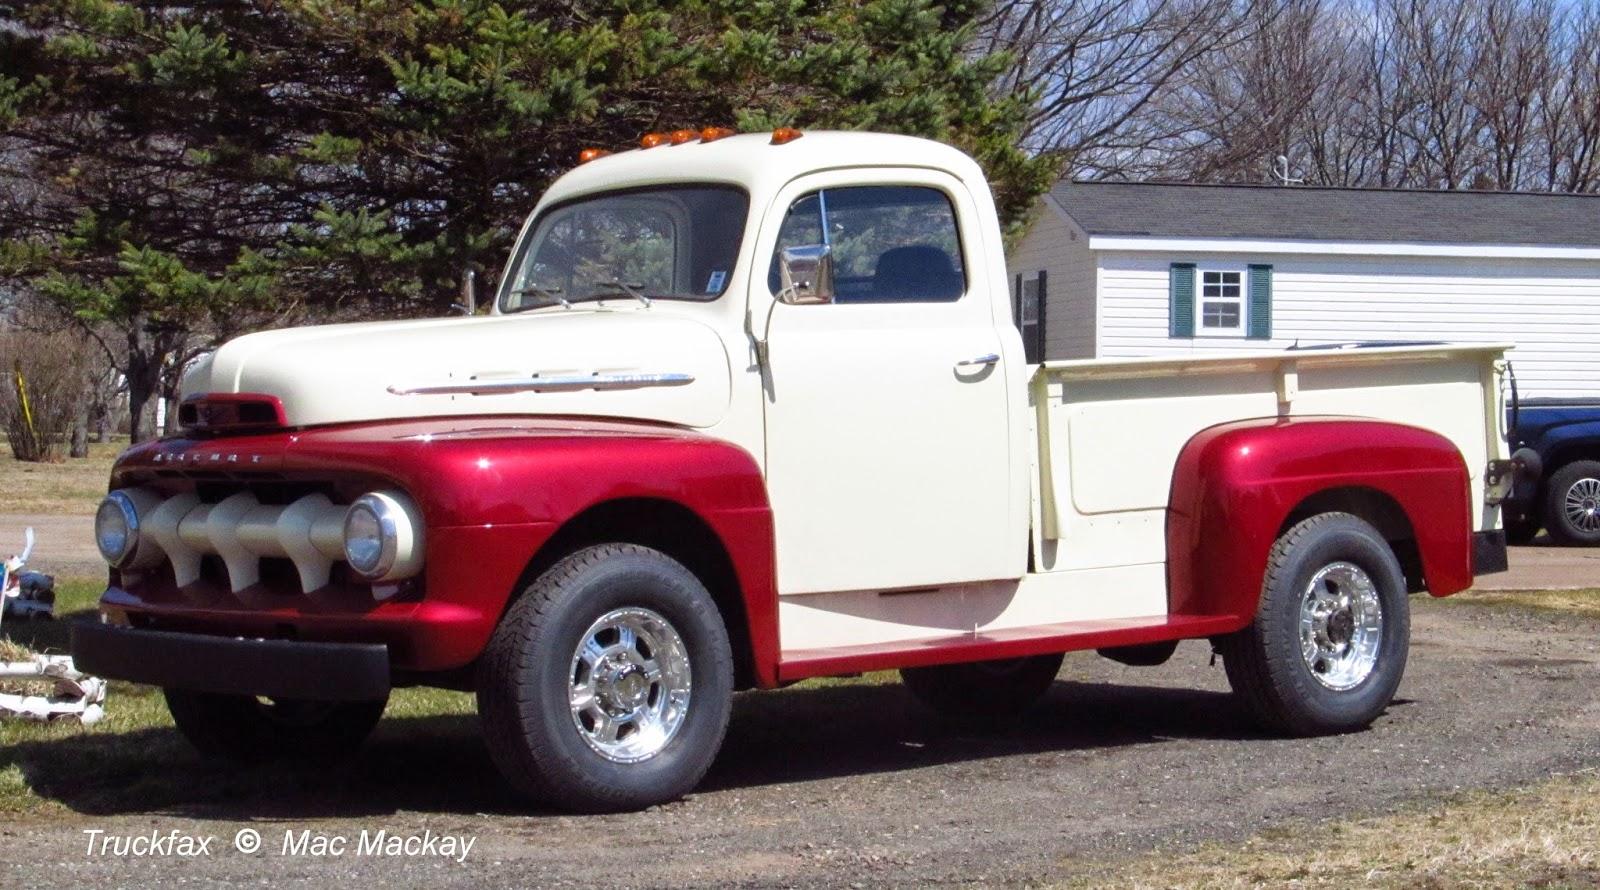 Truckfax: Mercury